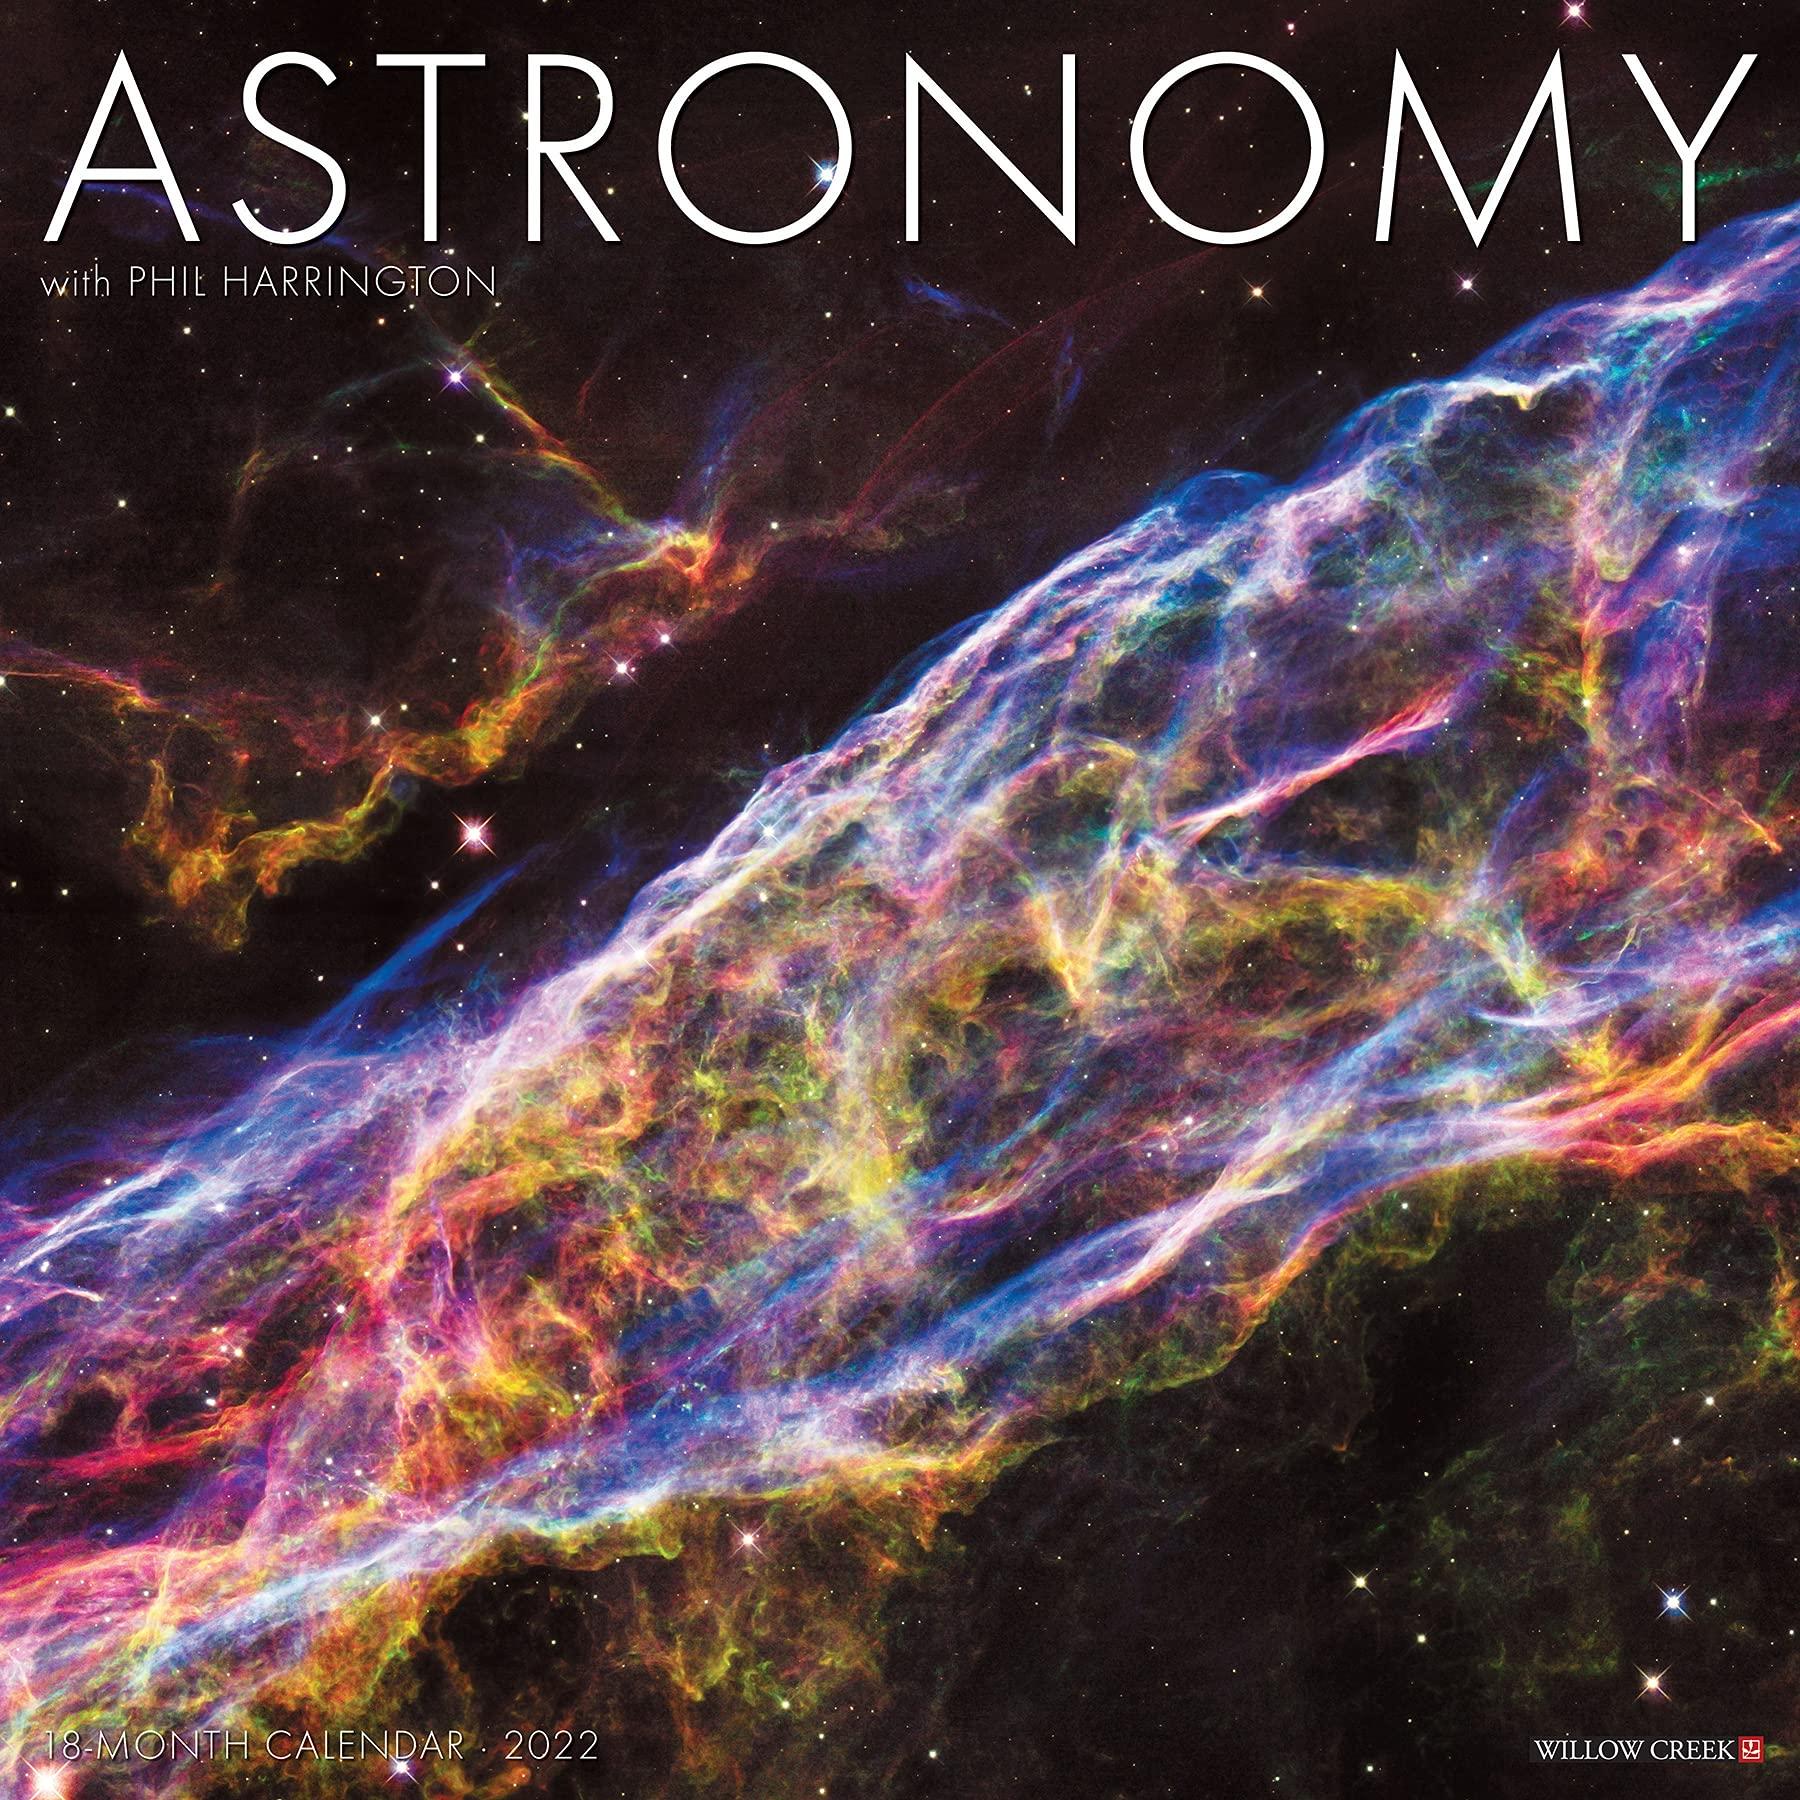 Astronomy Calendar 2022.Astronomy 2022 Wall Calendar Willow Creek Press 9781549216701 Amazon Com Books